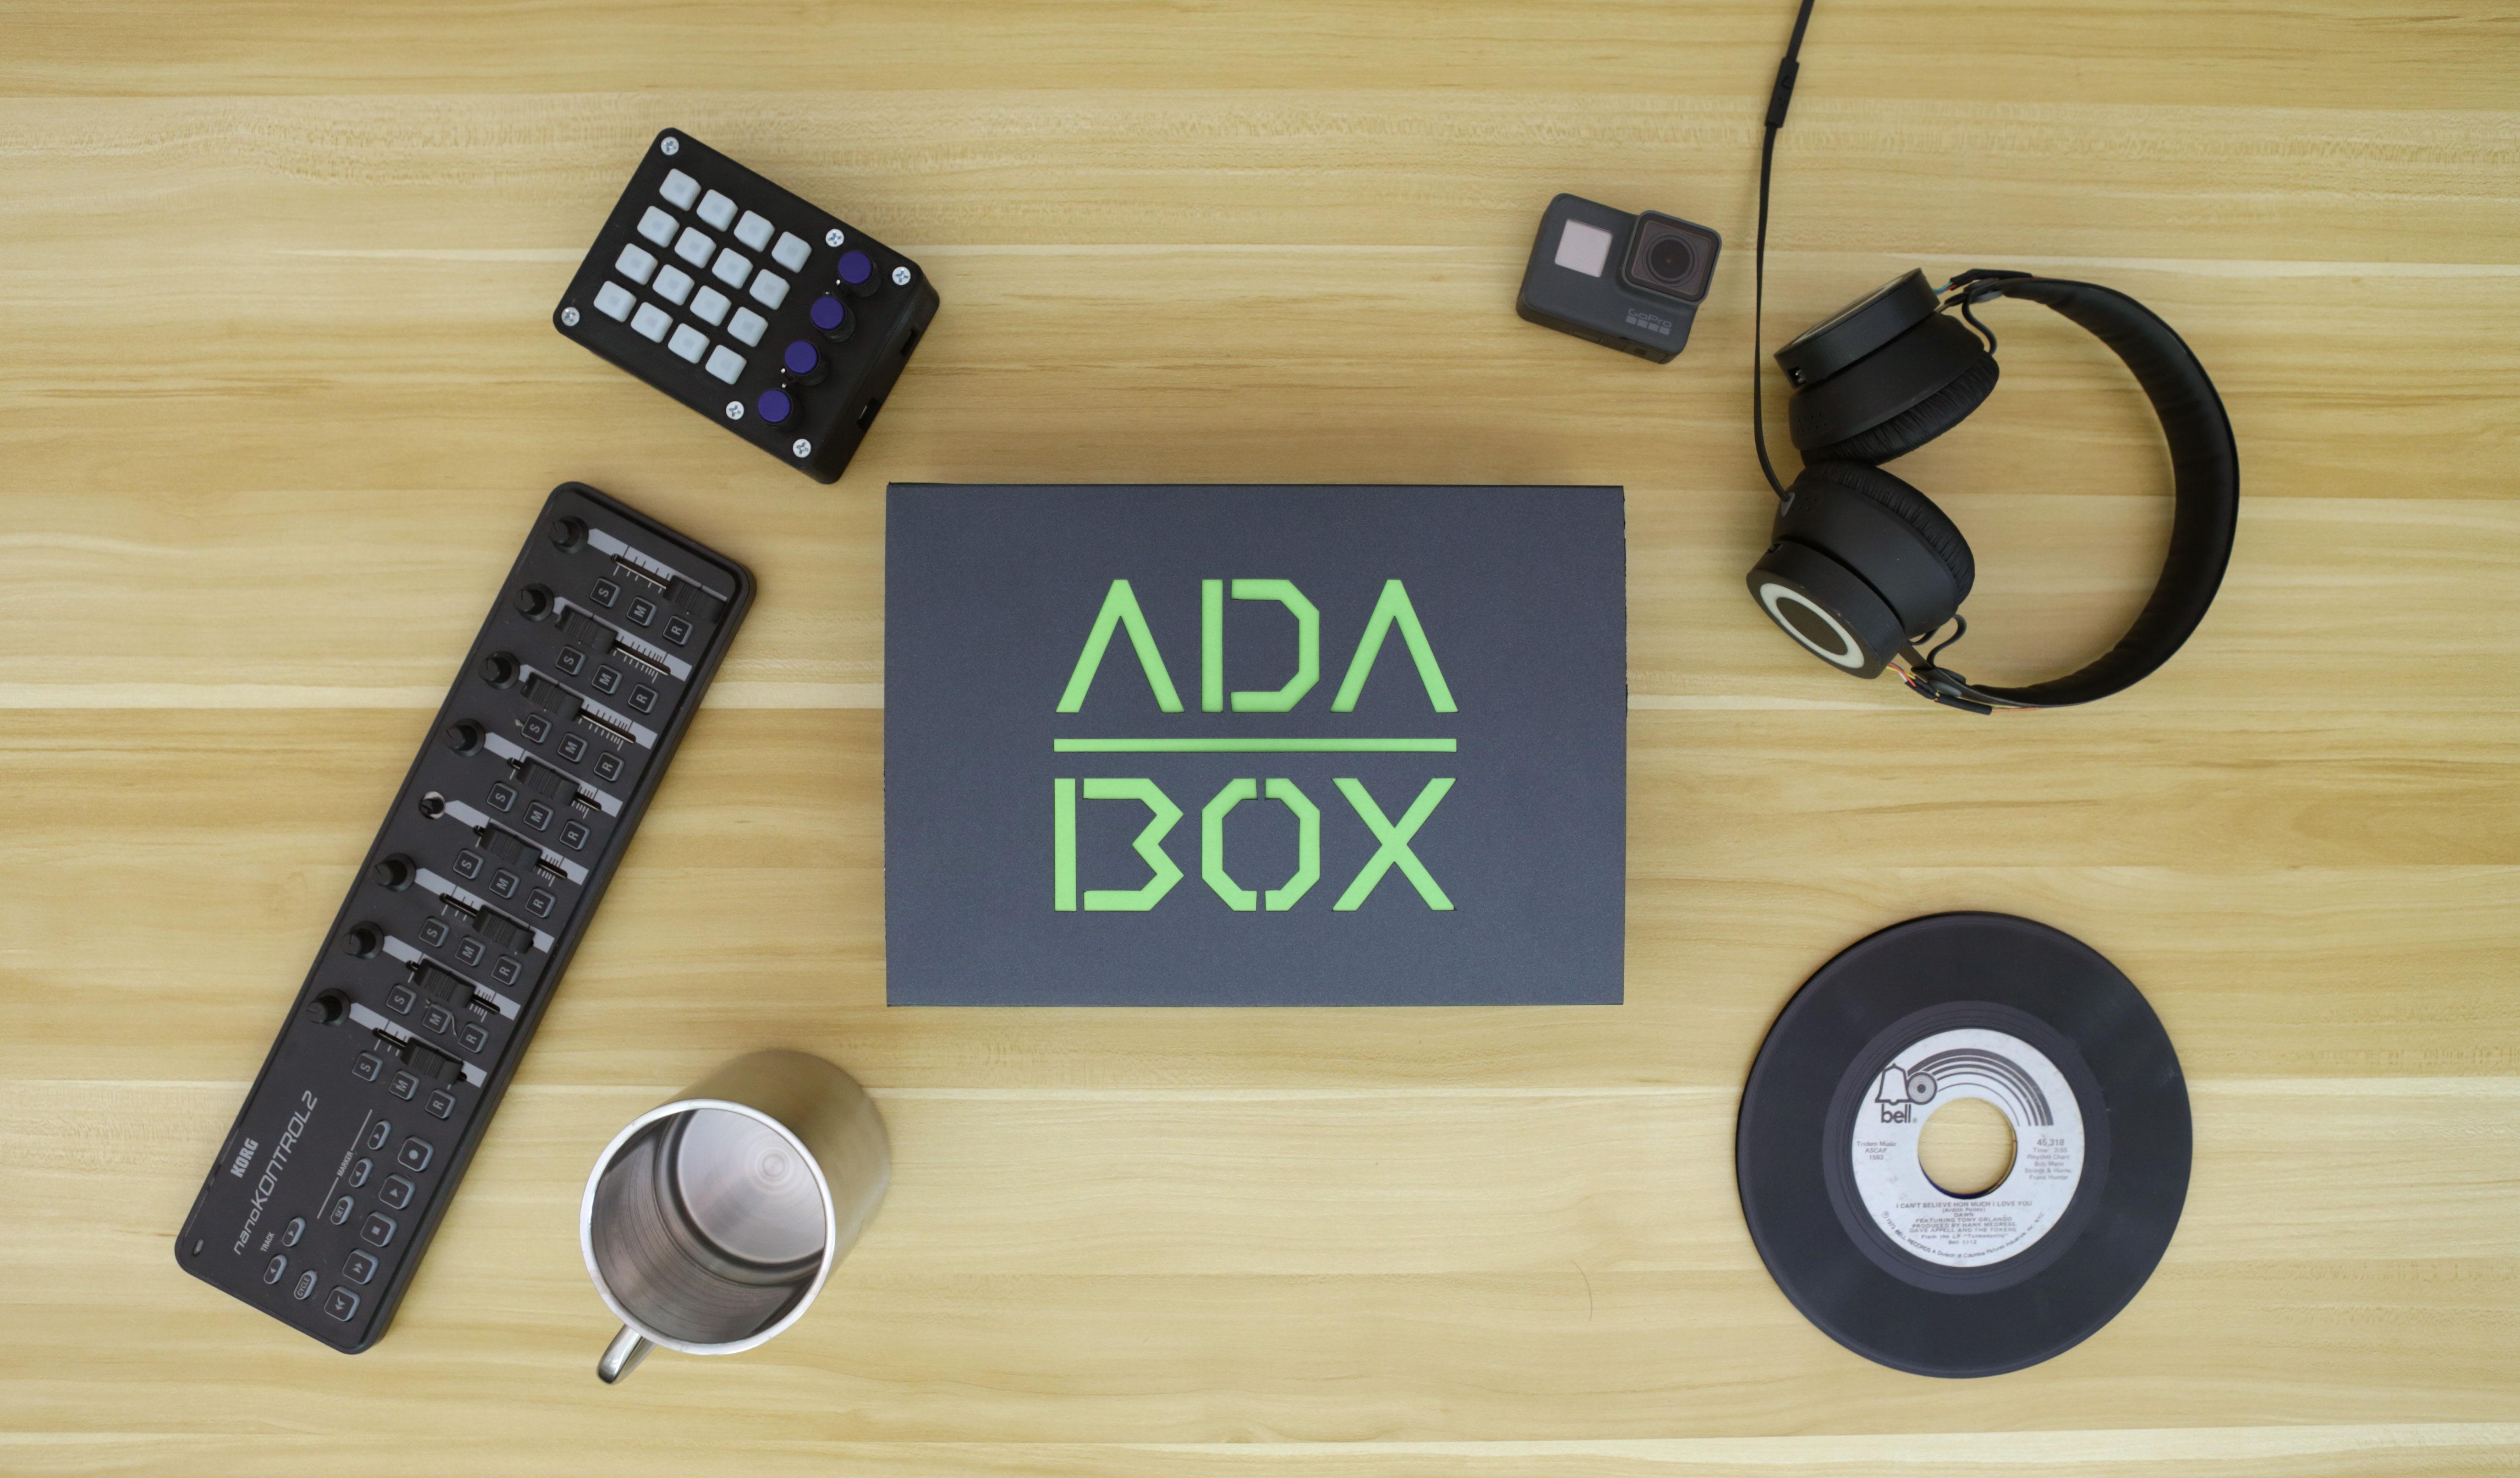 3d_printing_hero-adabox.jpg